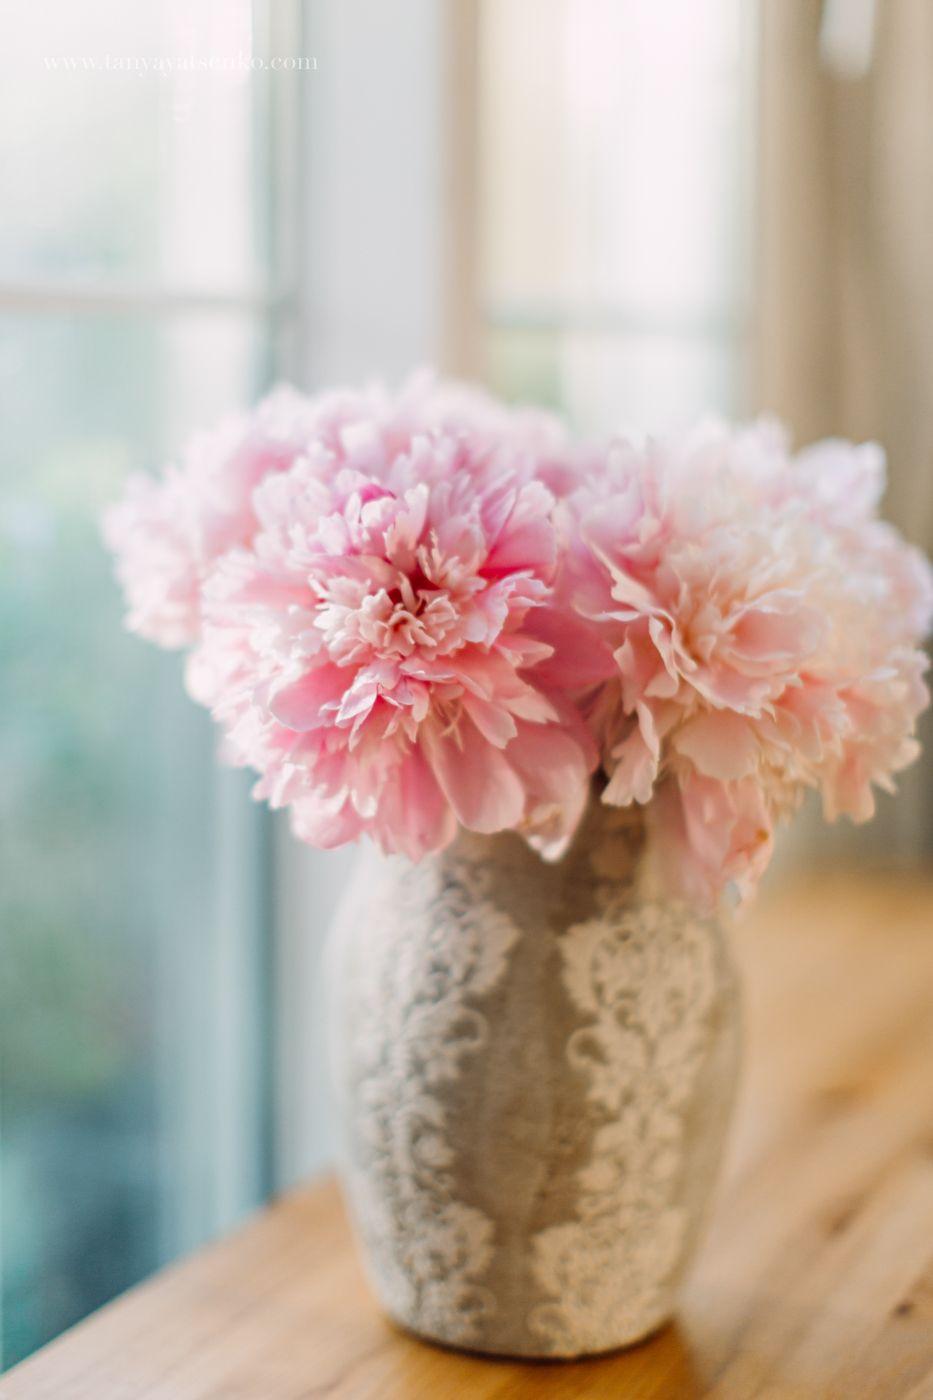 #peonies #peony #flowerlover #pink #pinkcolor